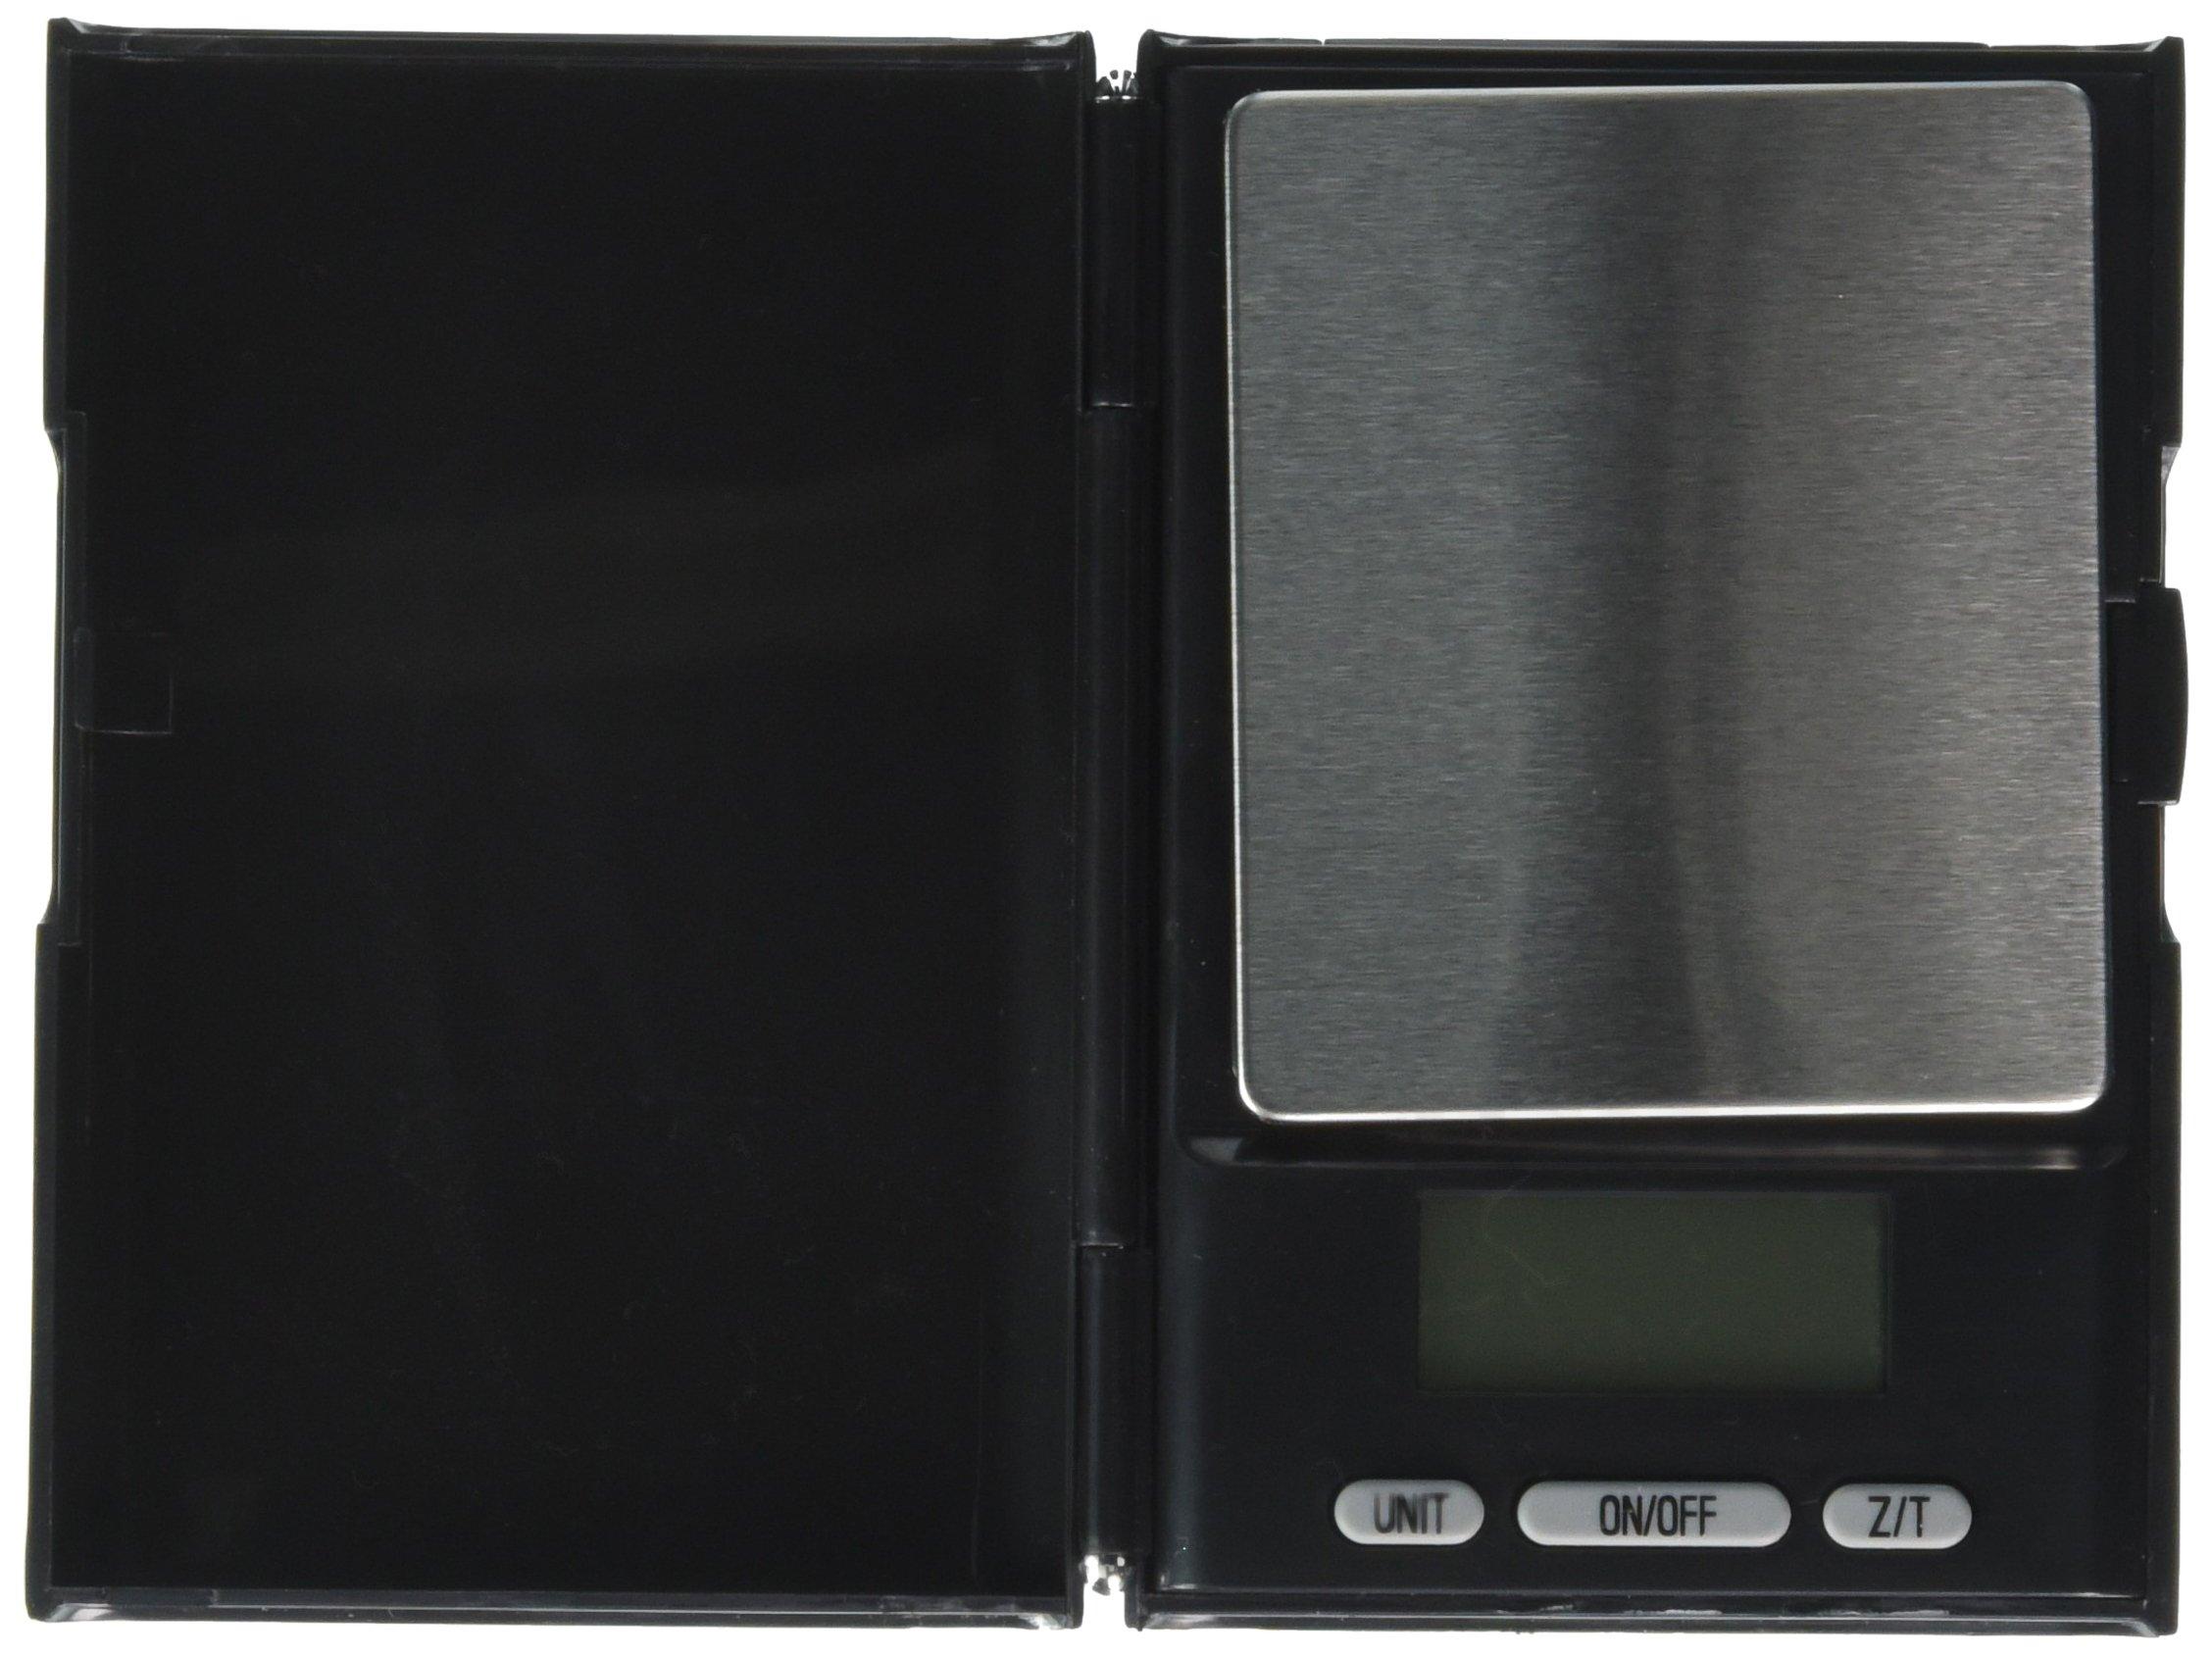 Camry 4.43 x 0.62 Inches Digital Postal Scale, Black (EHA25110)